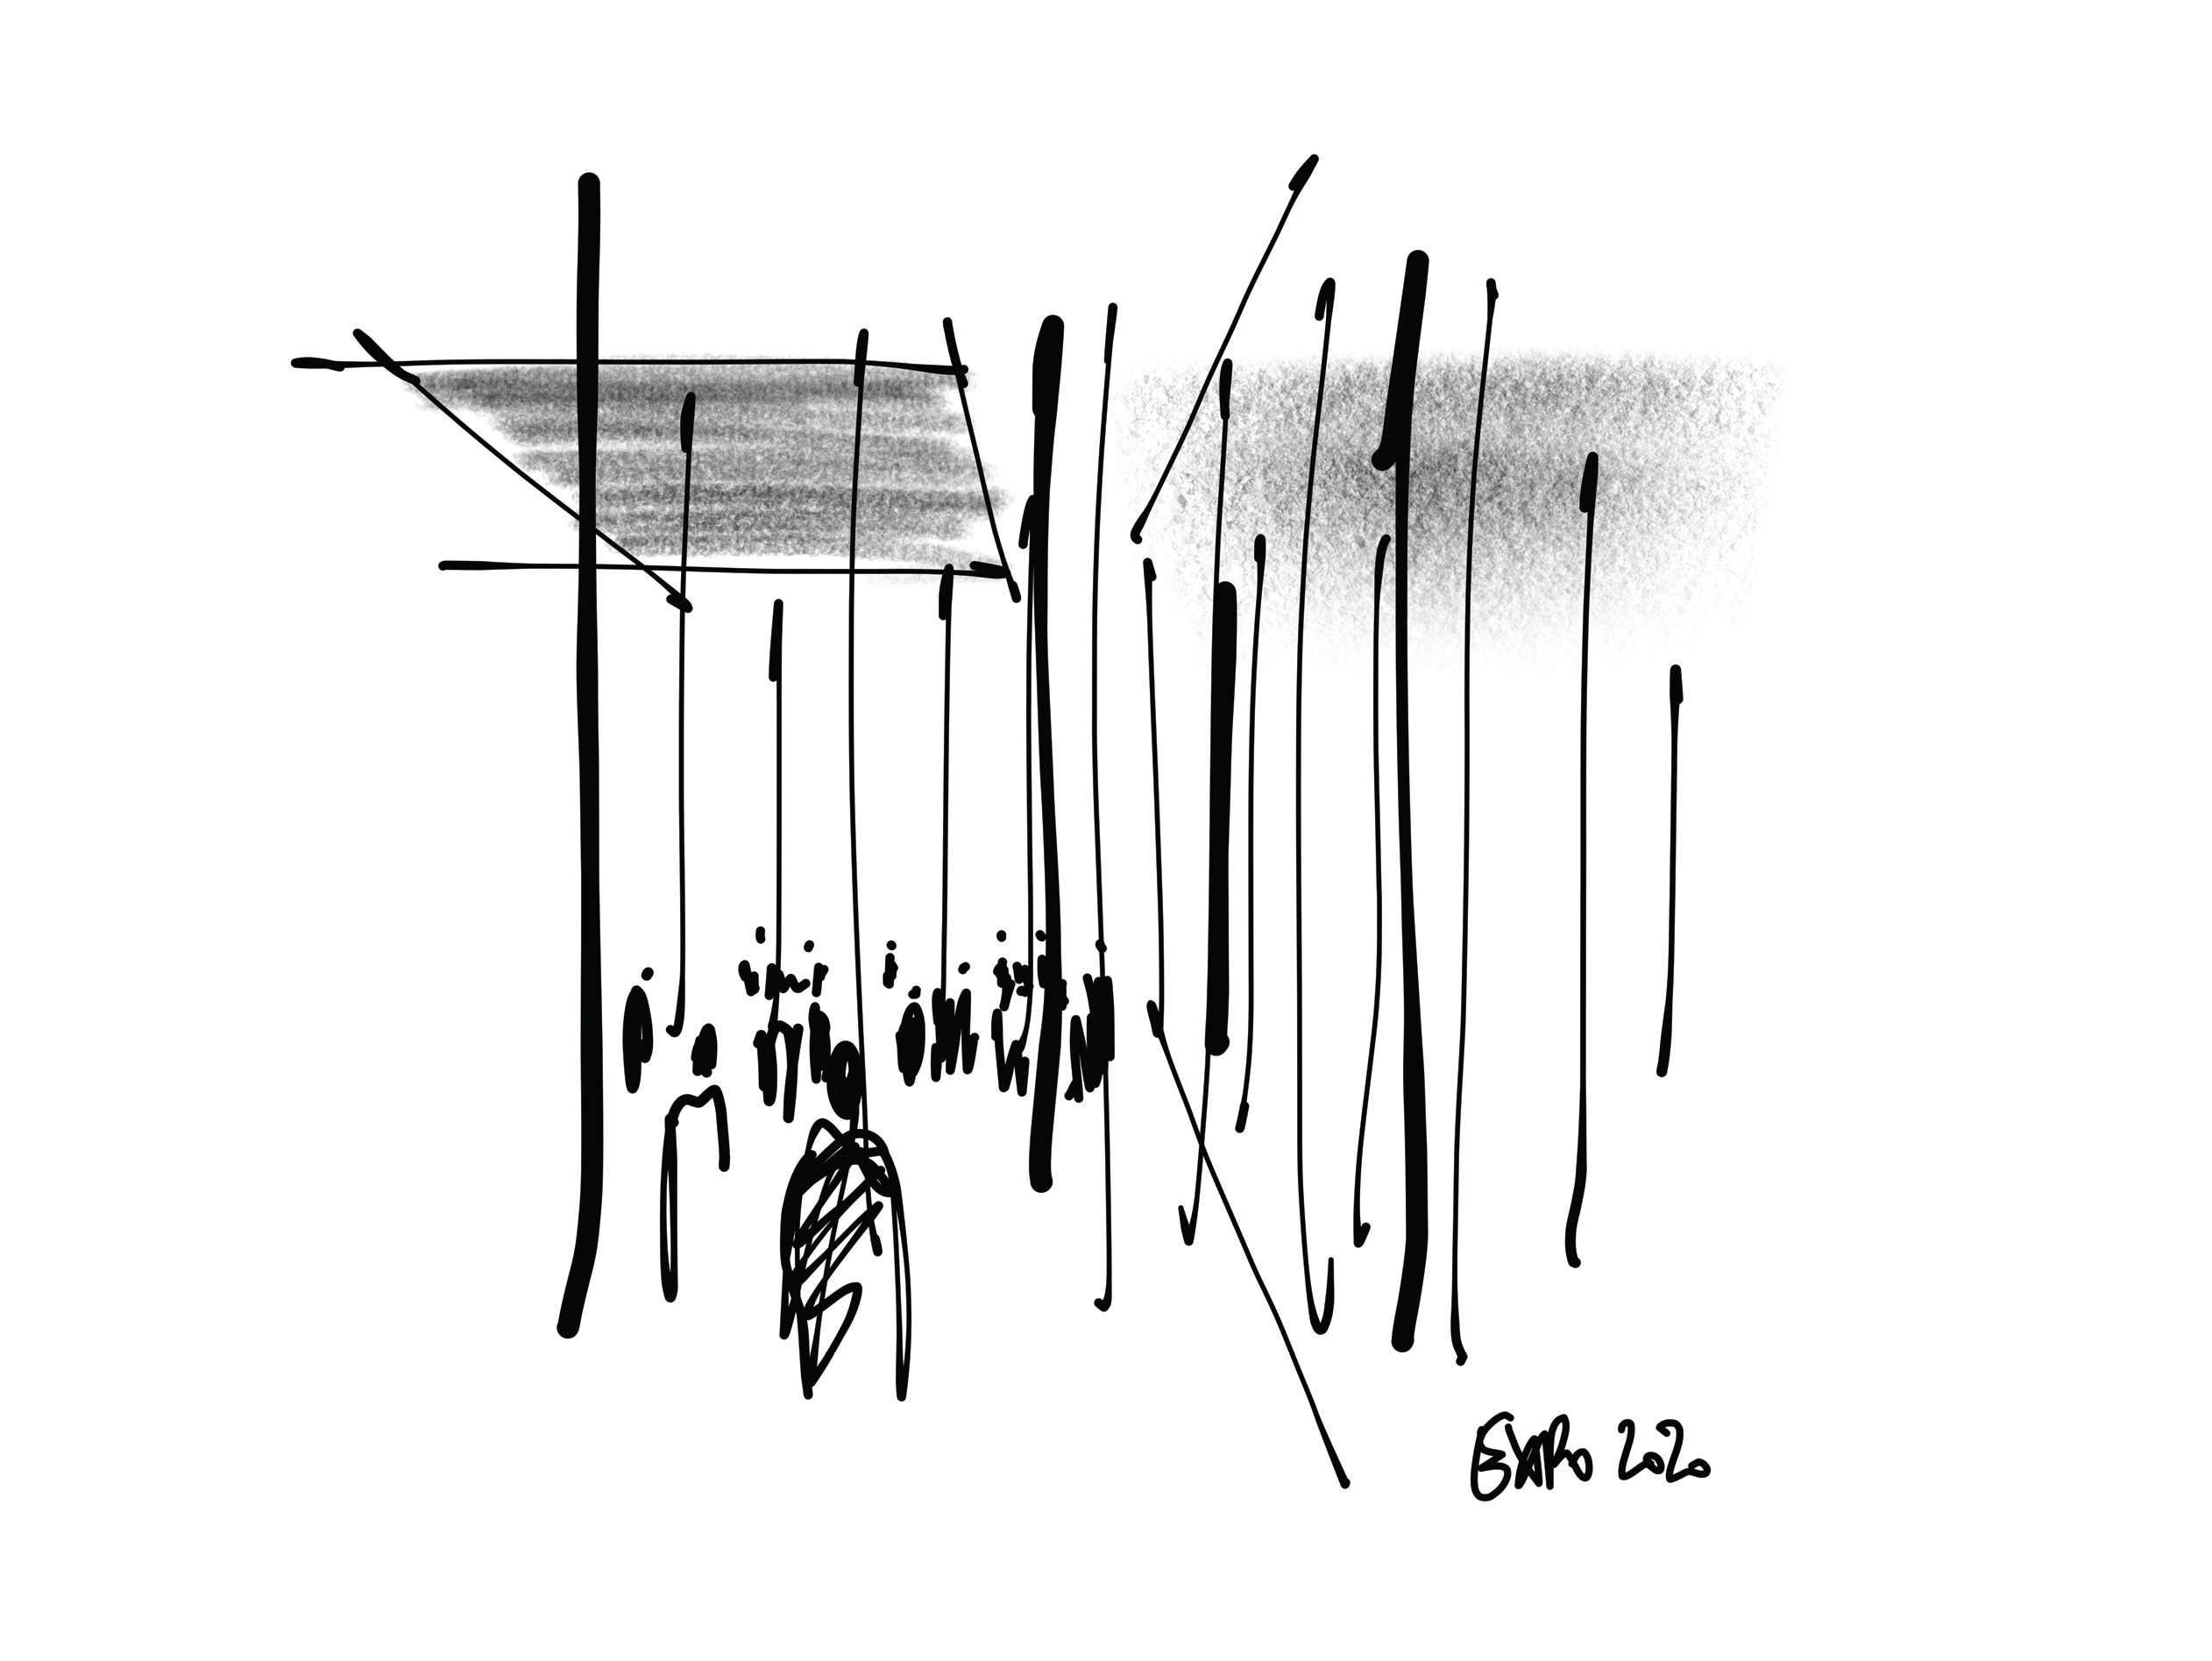 Alessandro-Ripellino-Arkitekter_Studio-Adrien-Gardere_Luigi-Pardo-Architetti_the-forest_sketch